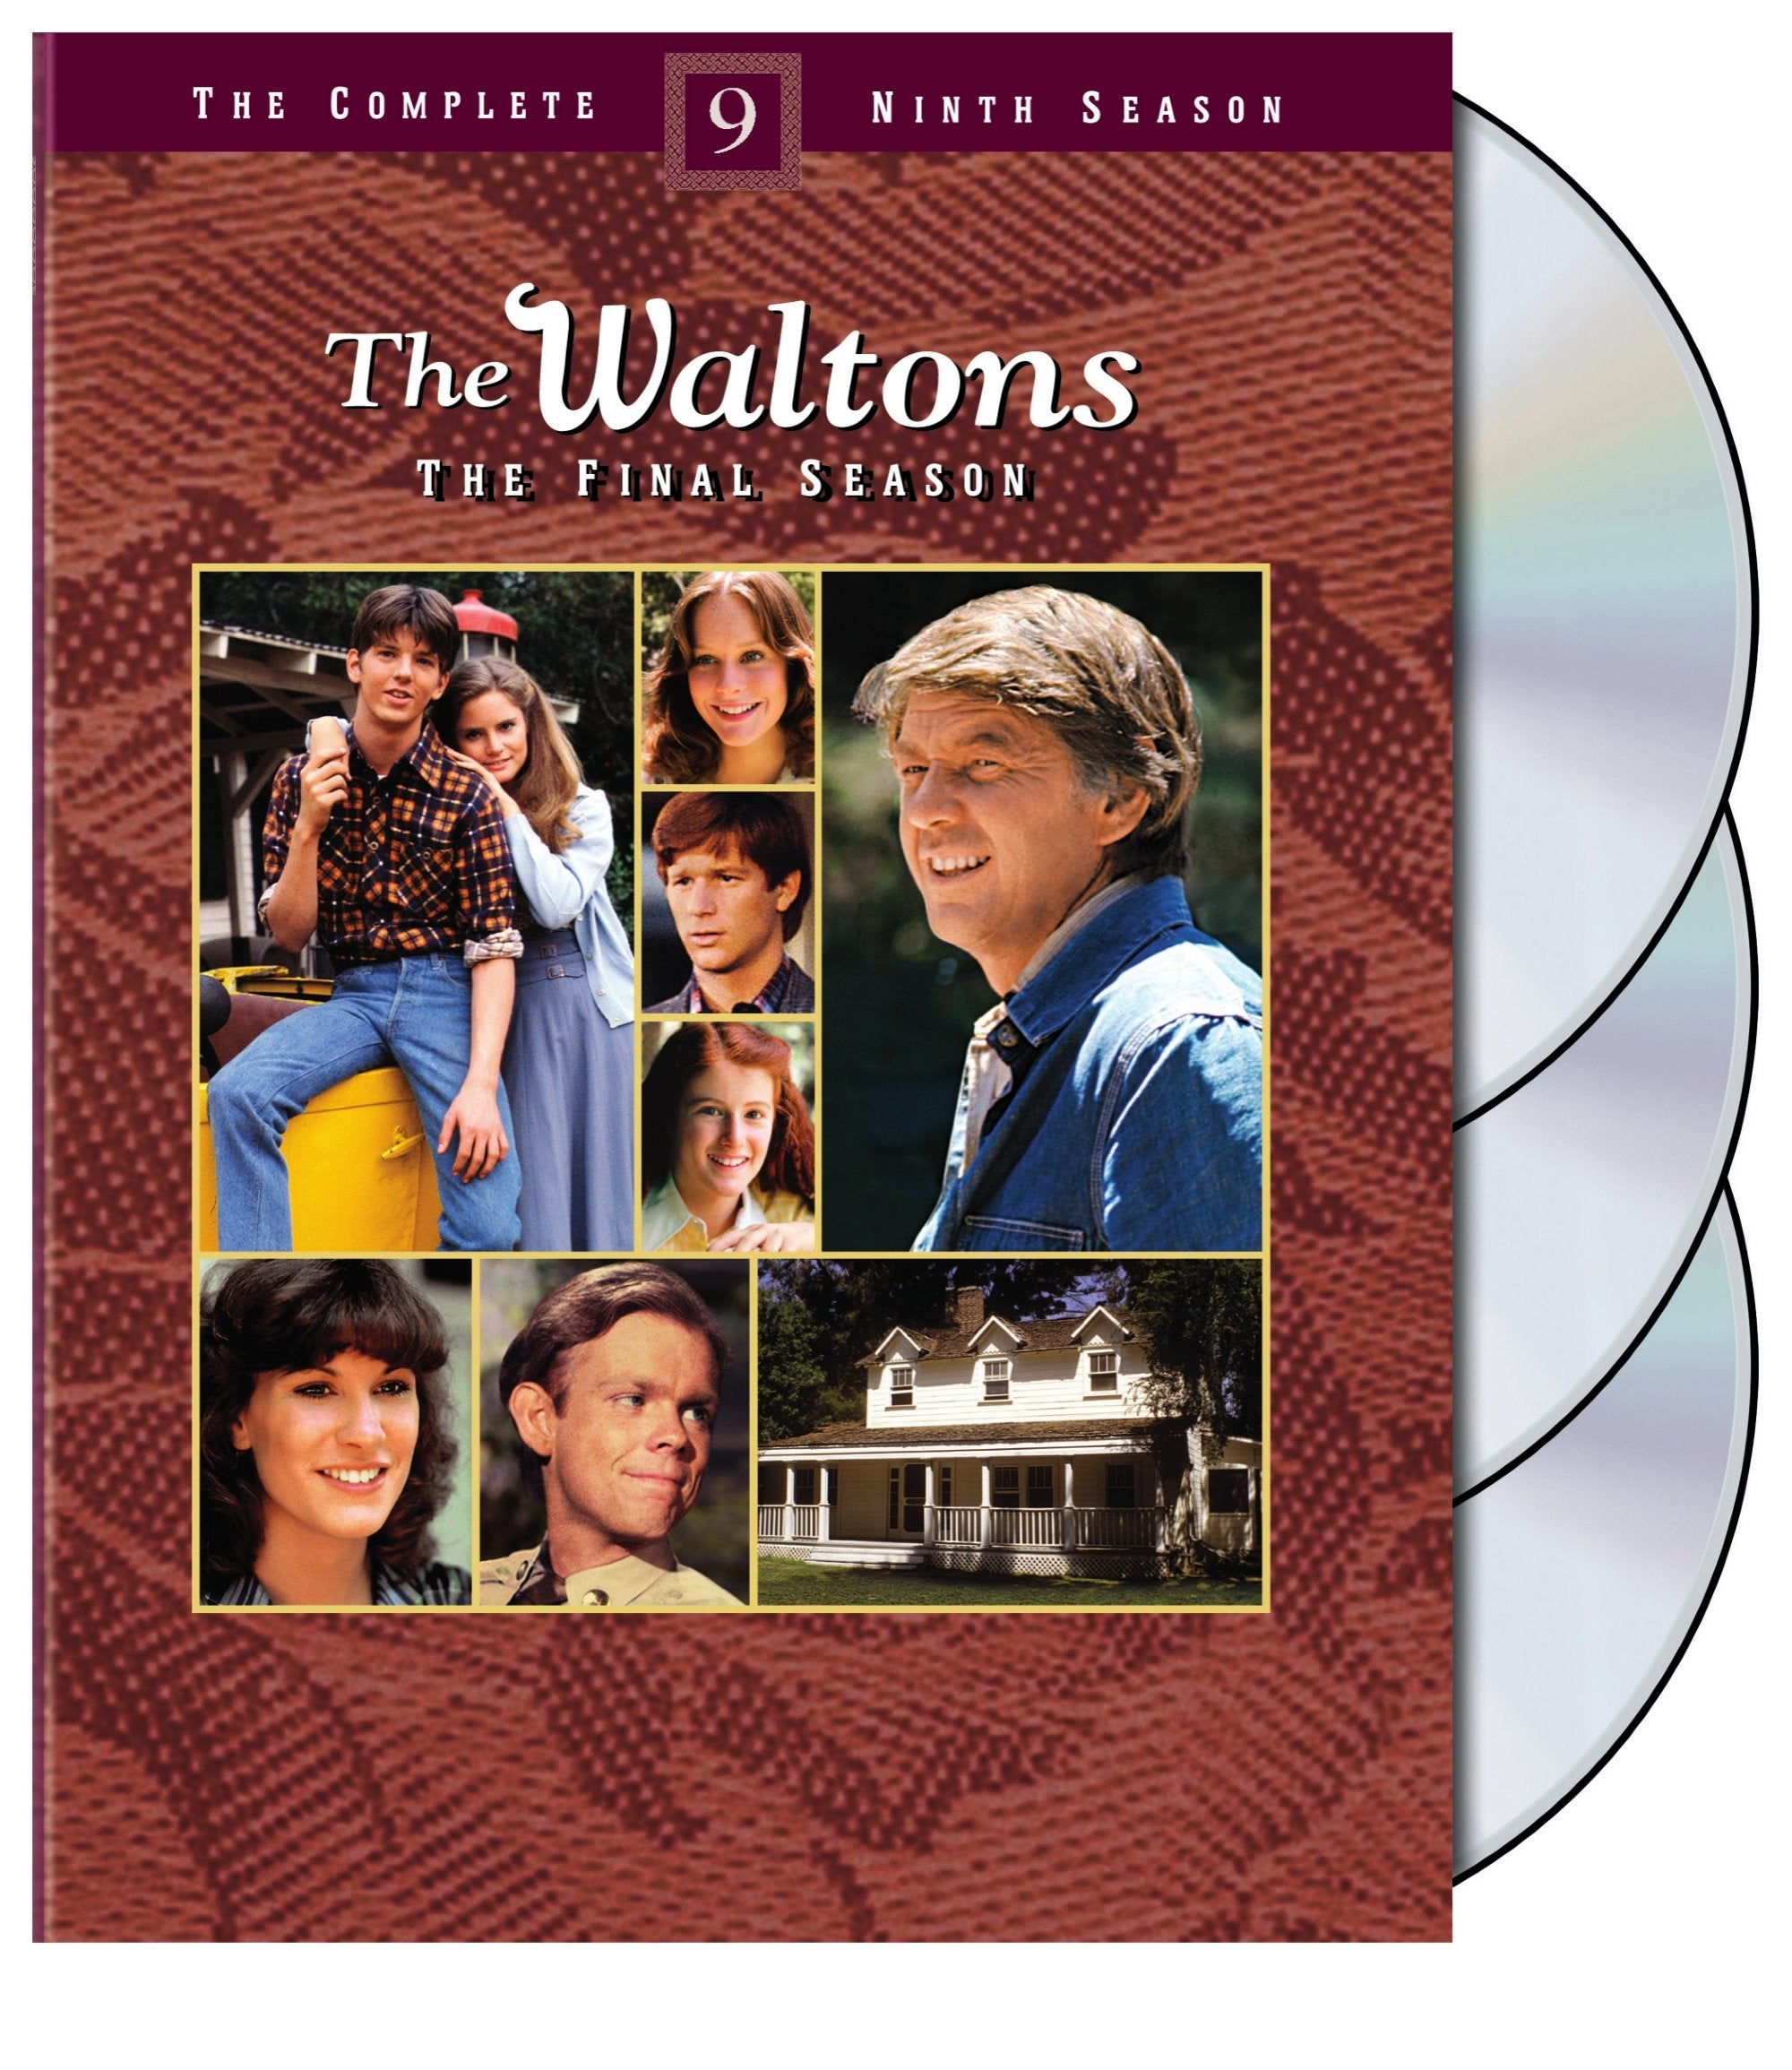 The Waltons: The Complete Ninth Season (DVD)